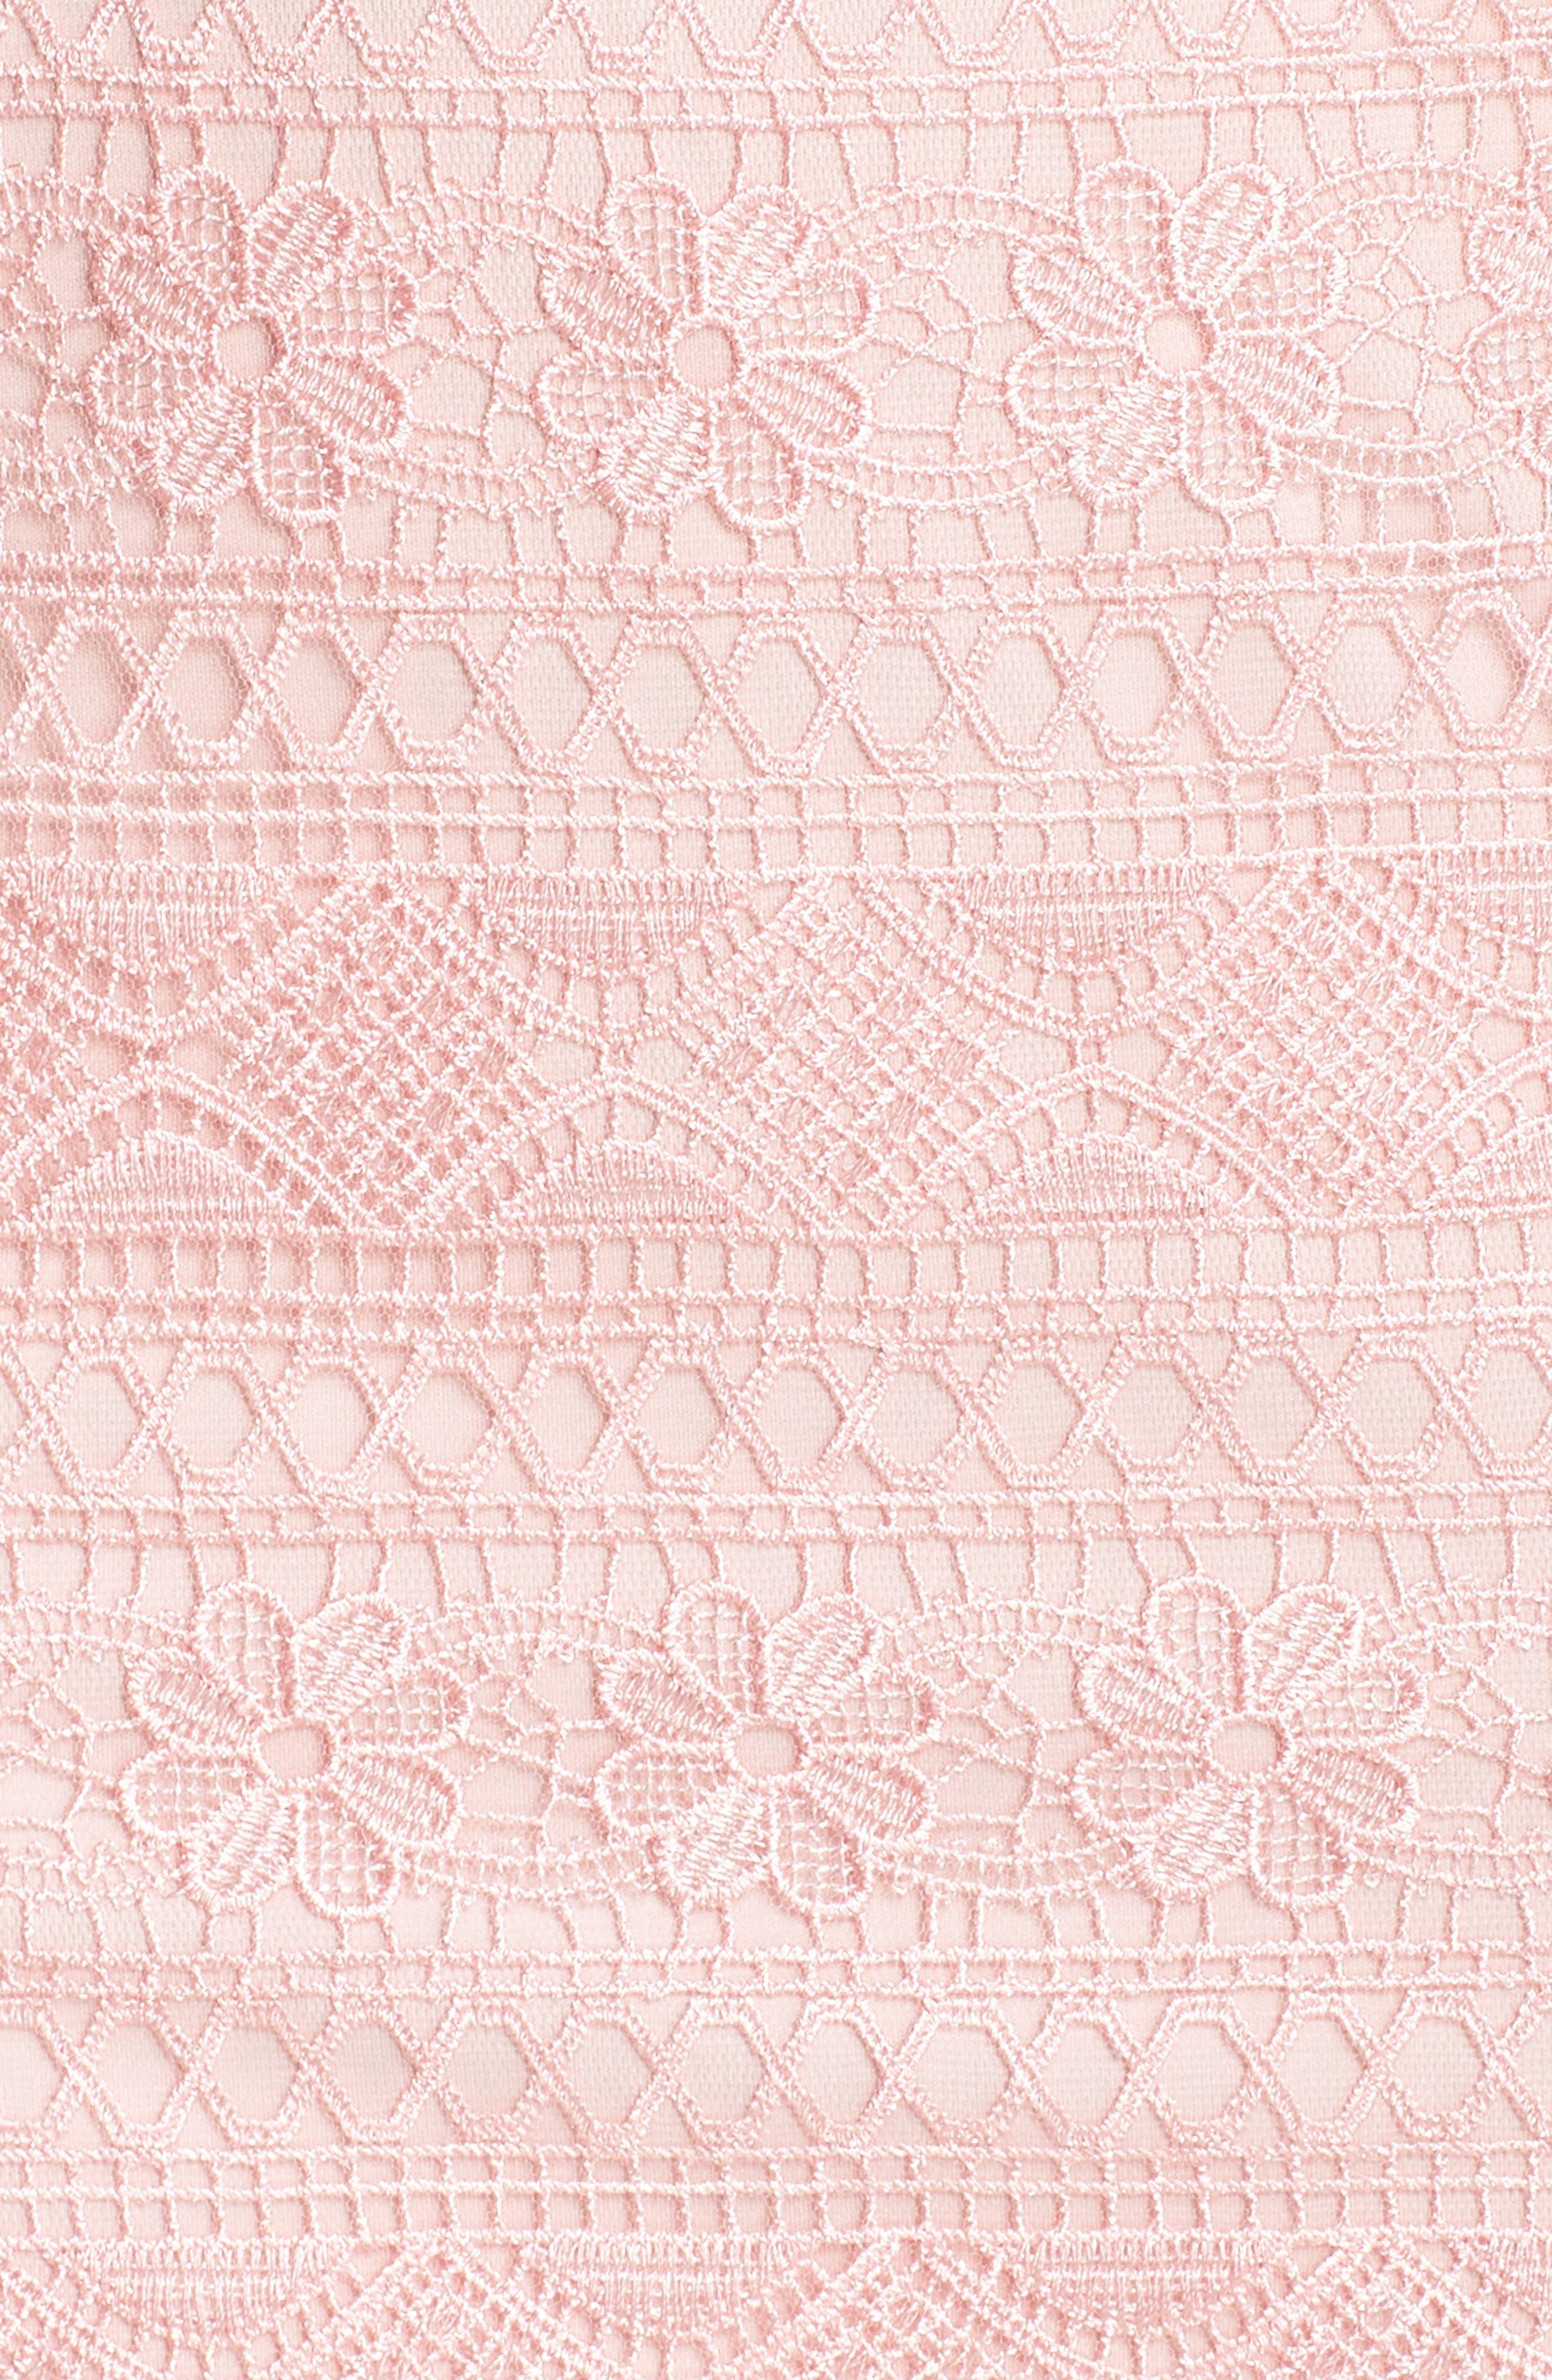 Embroidered Lace Sheath Dress,                             Alternate thumbnail 5, color,                             ROSE QUARTZ